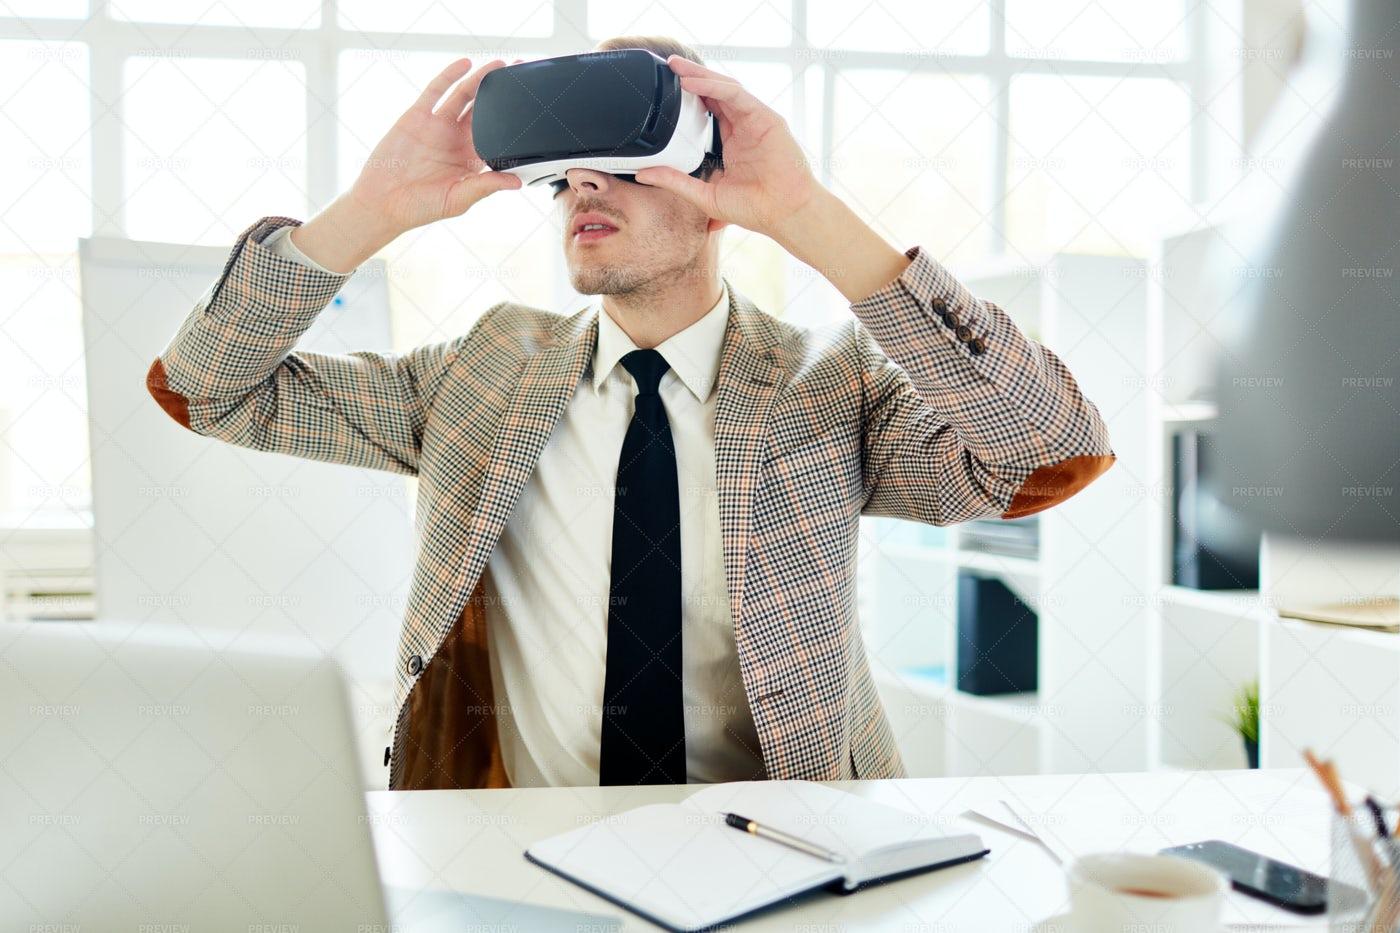 Interior Designer Using VR Headset: Stock Photos